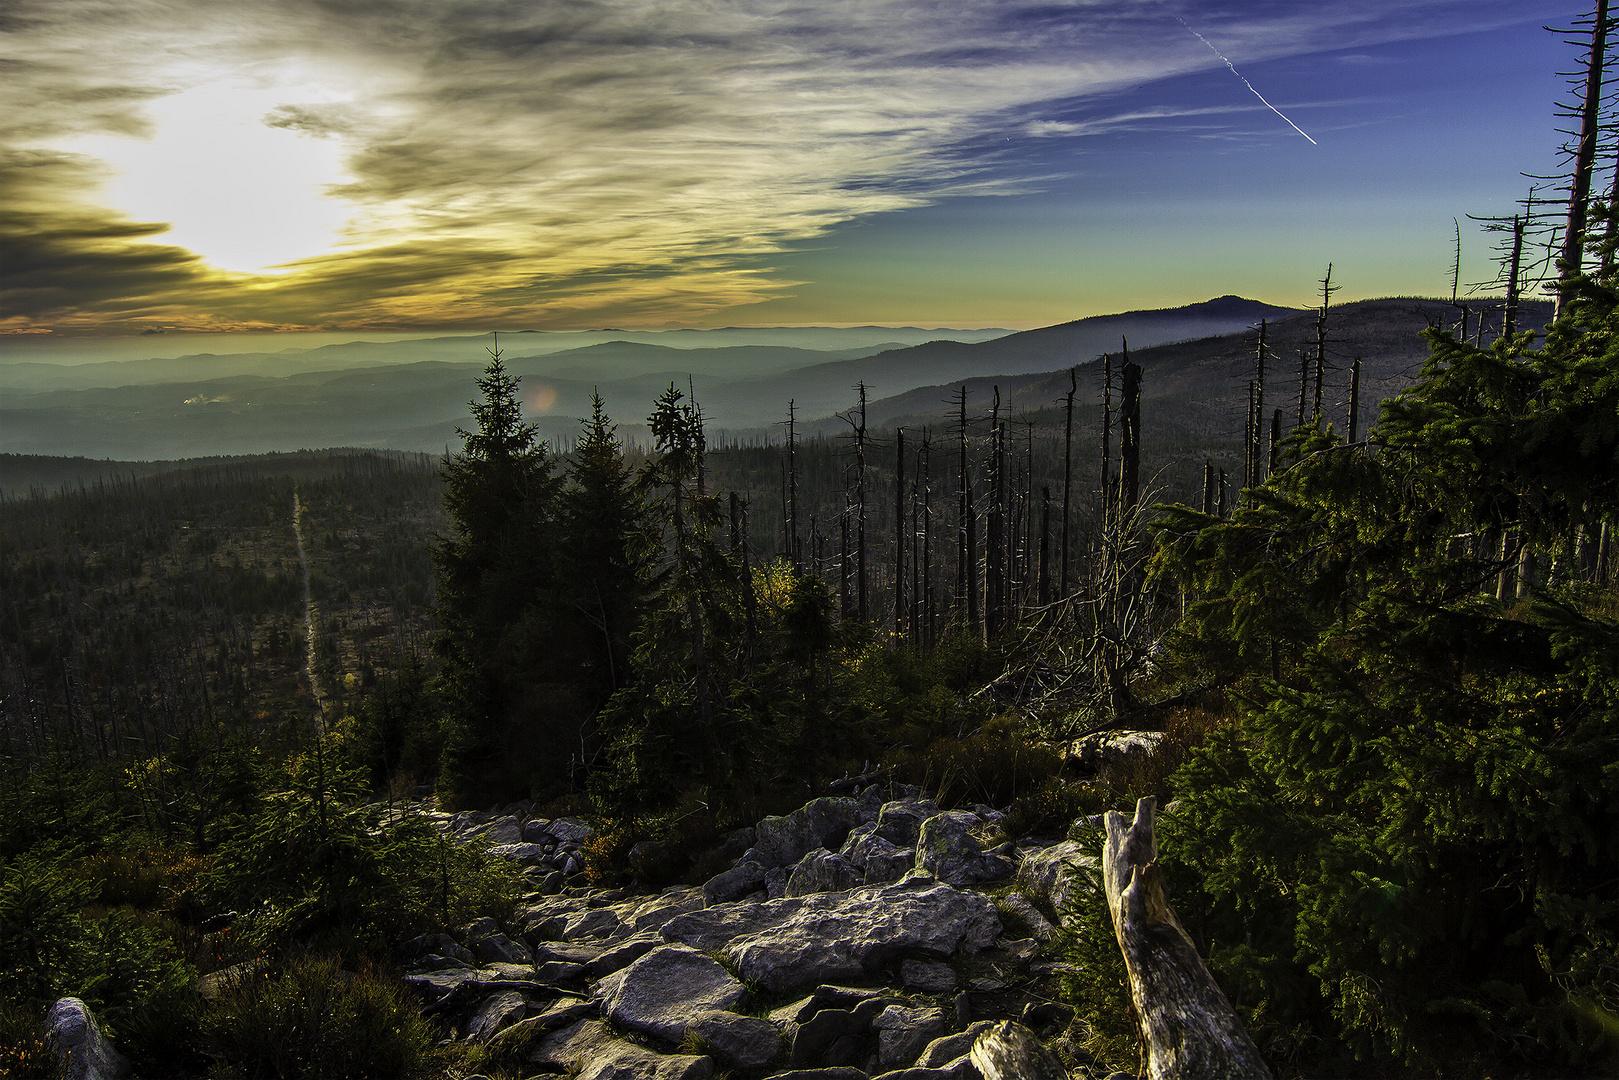 Sonnenuntergang am Gipfel des Lusen